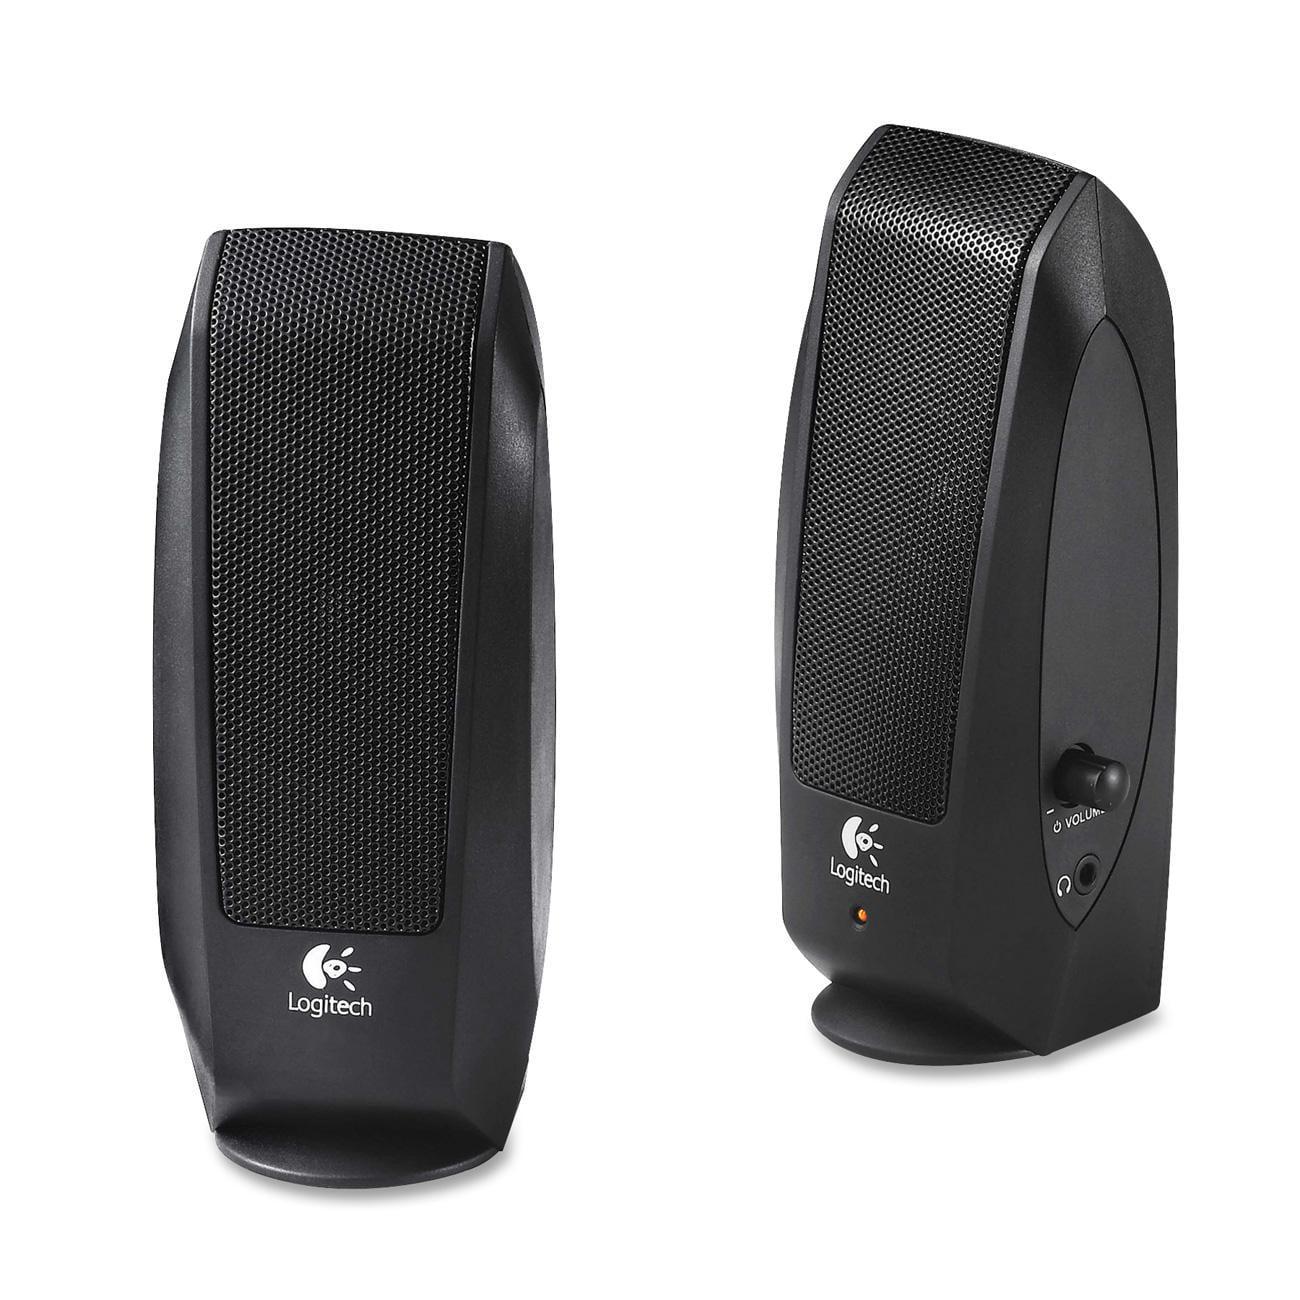 Logitech S-120 2.0 Speaker System - 2.30 W RMS - Black